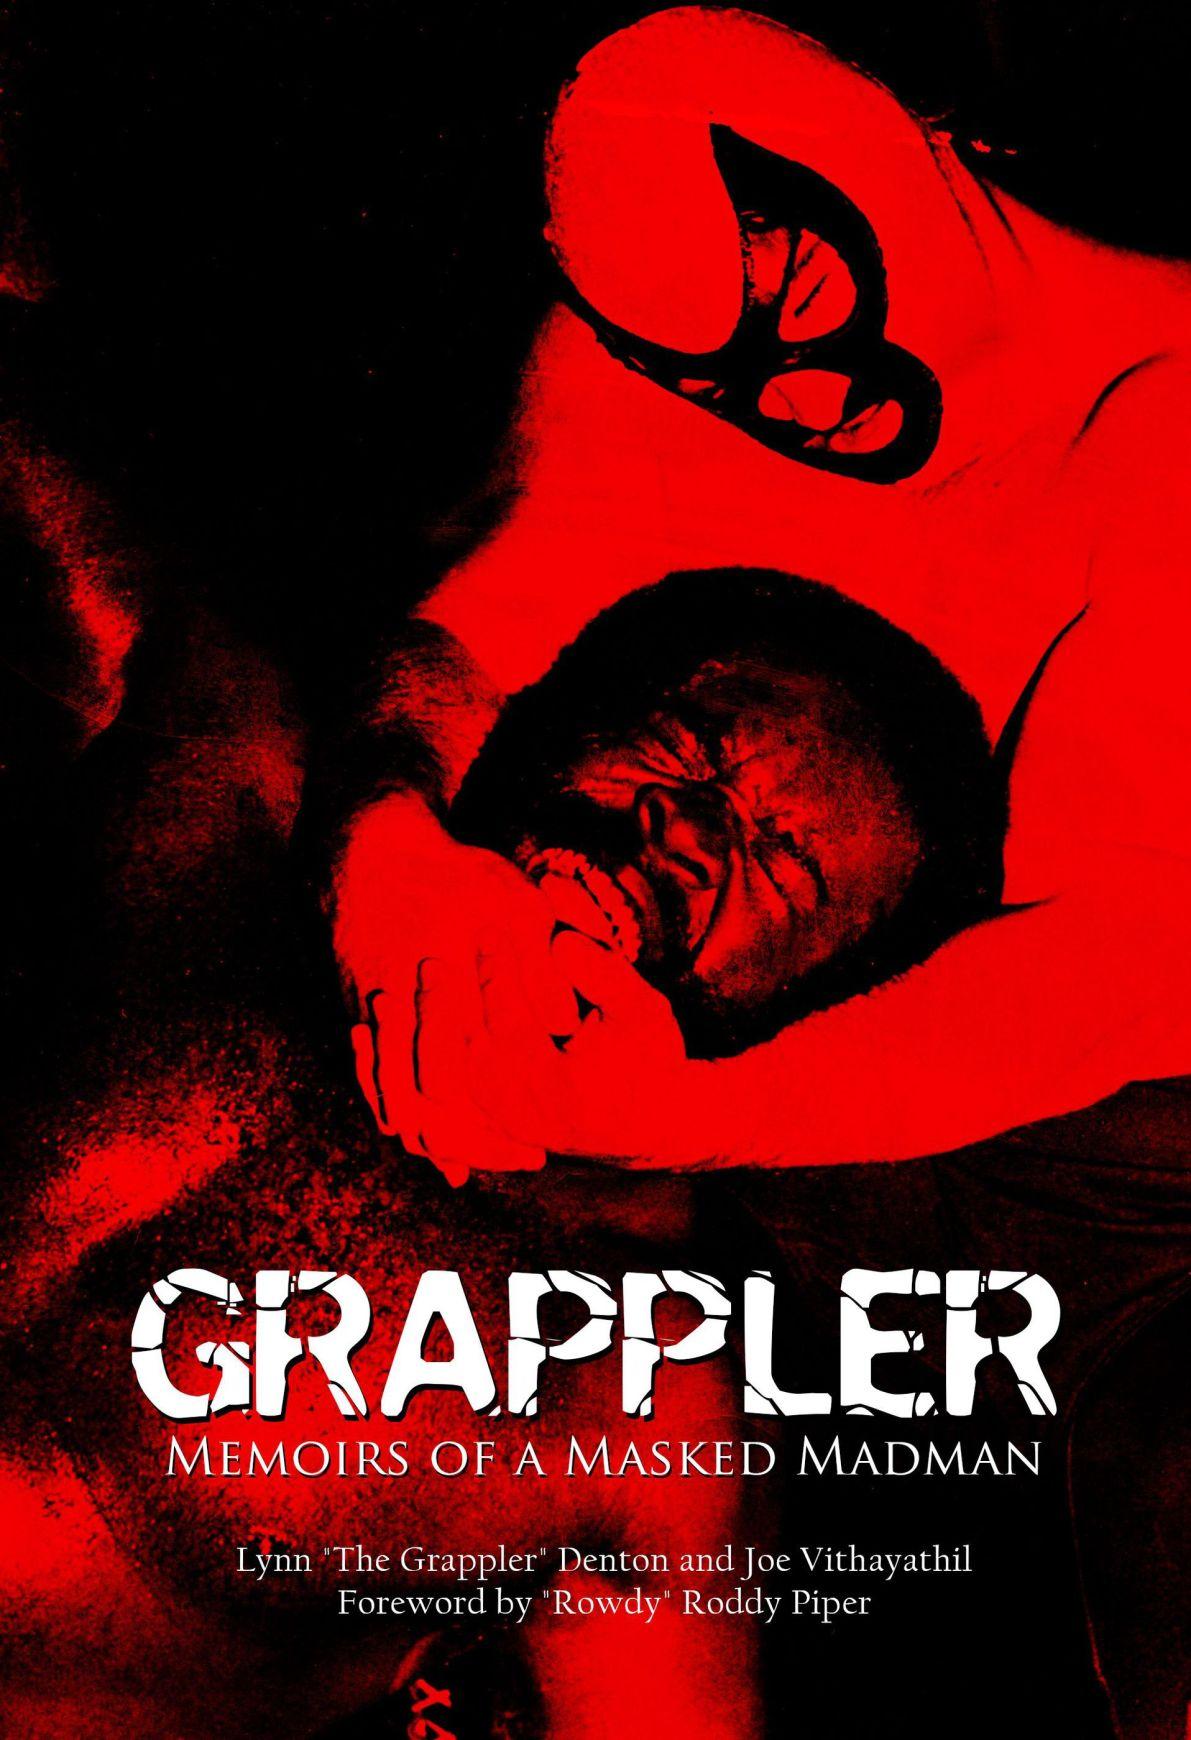 Grappler's journey through the world of professional wrestling